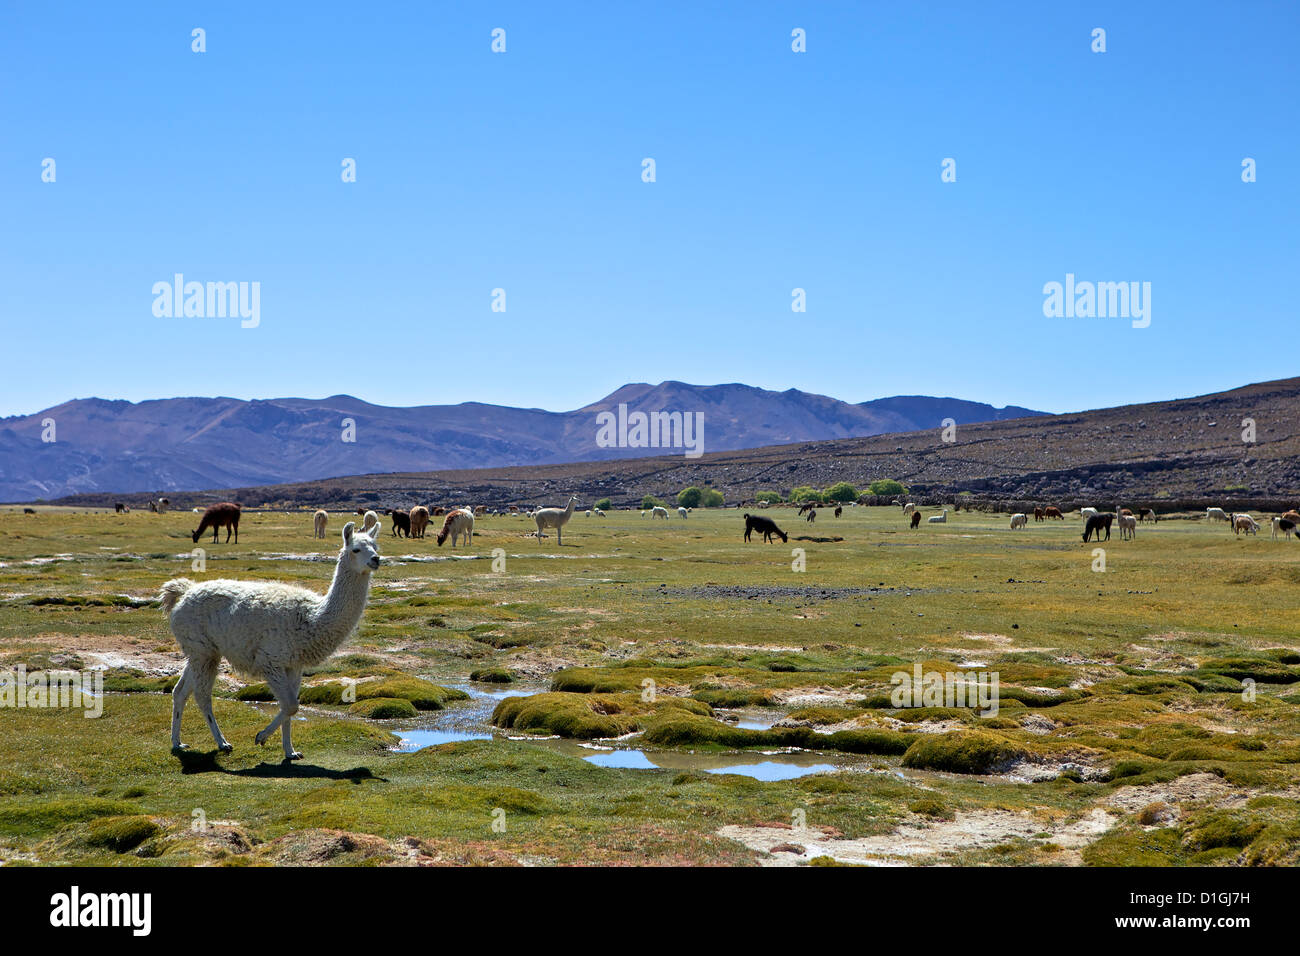 Llamas and alpacas grazing, Tunupa, Bolivia, South America - Stock Image